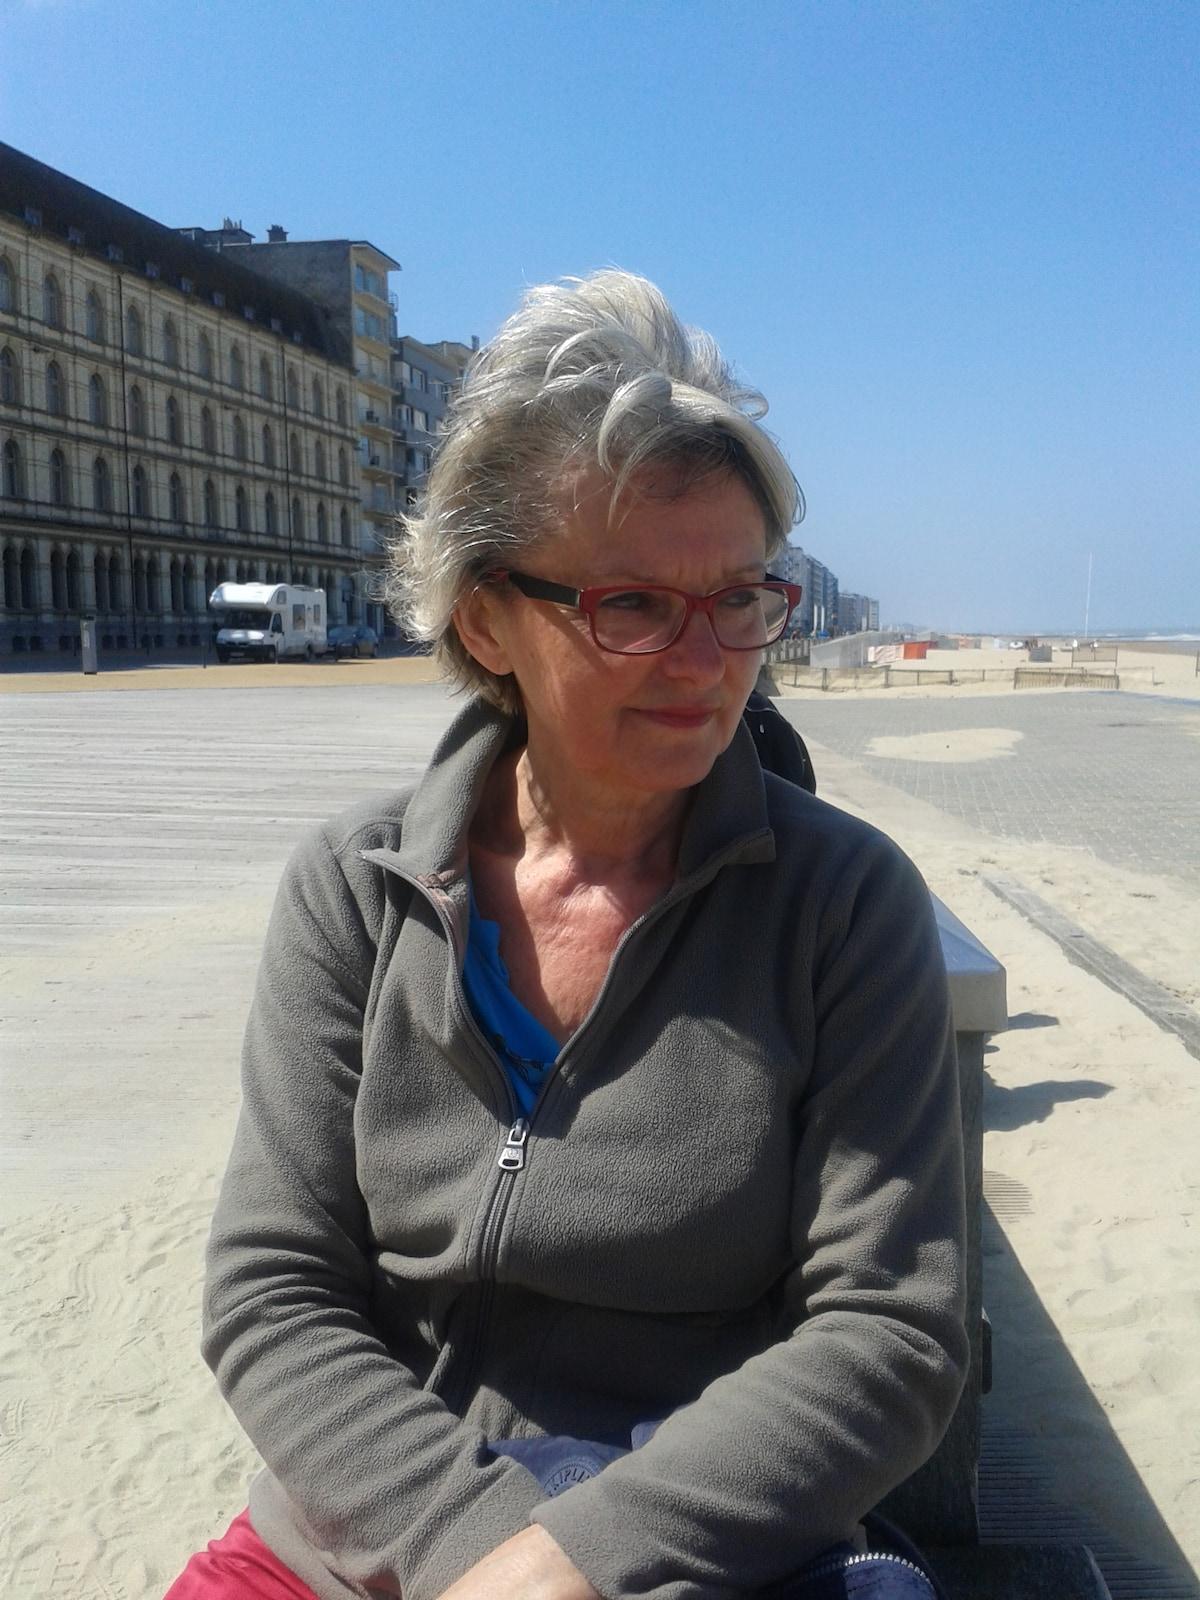 Rita from Bruges